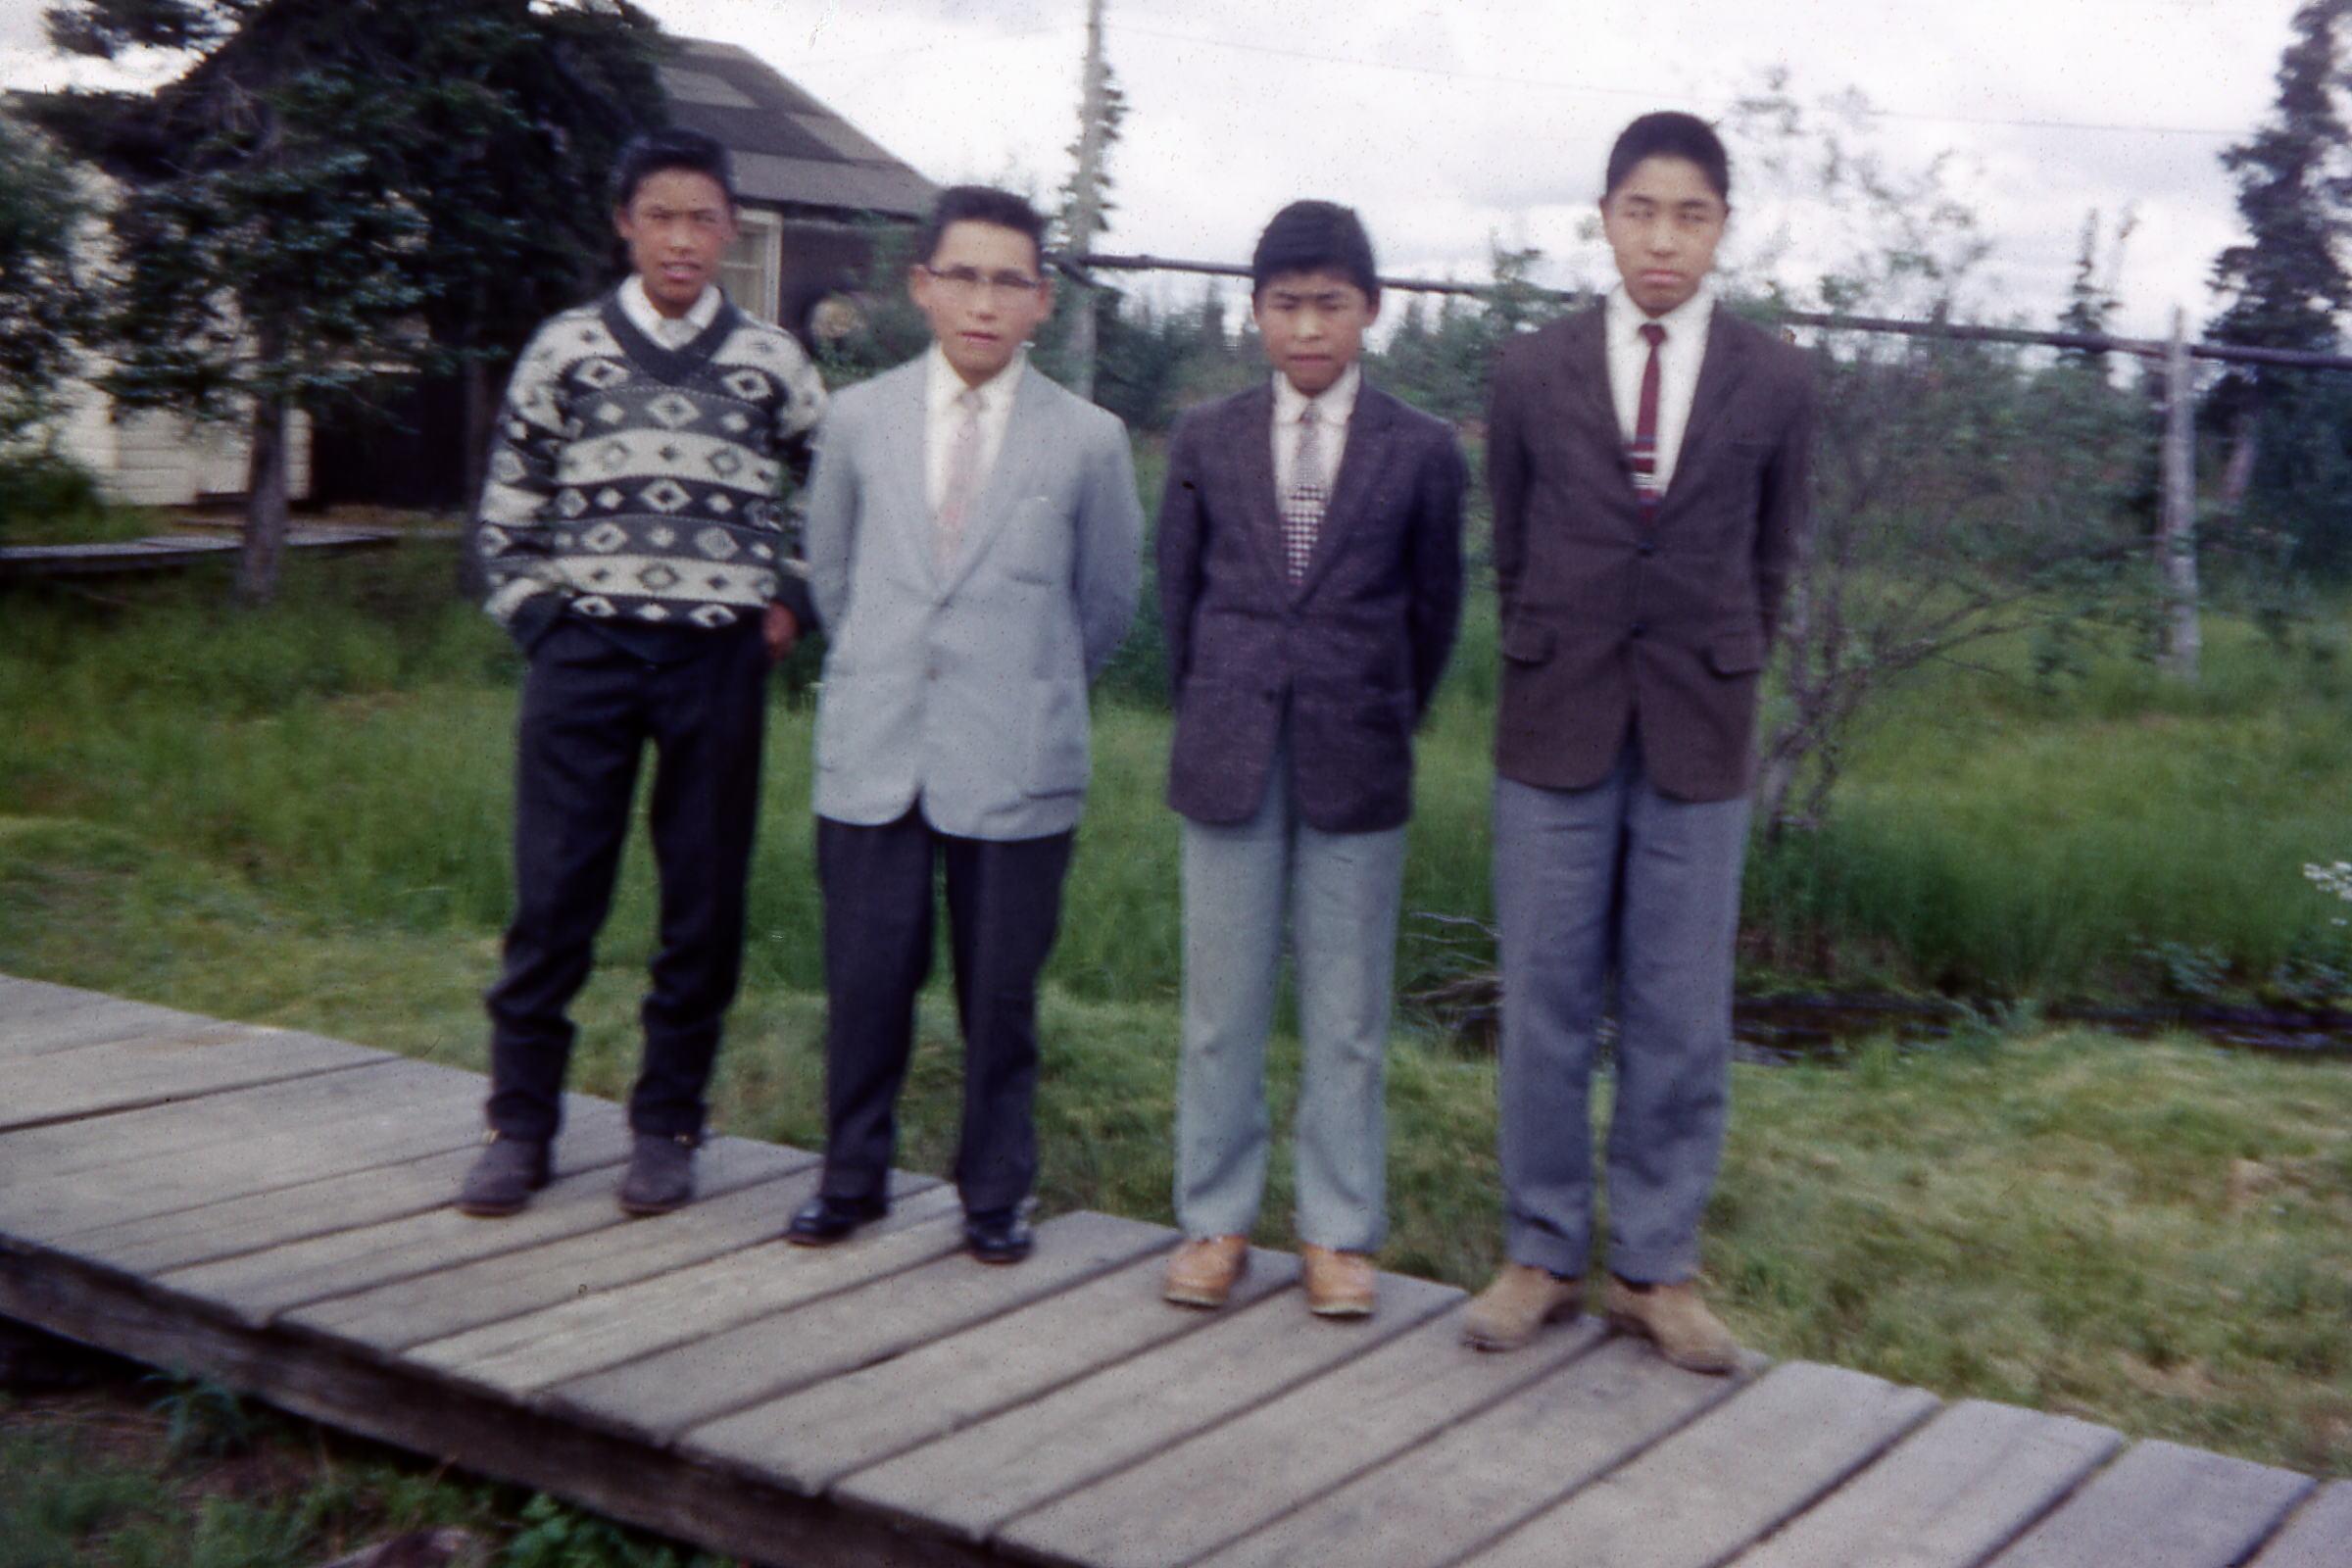 1964 - John Fox and boys